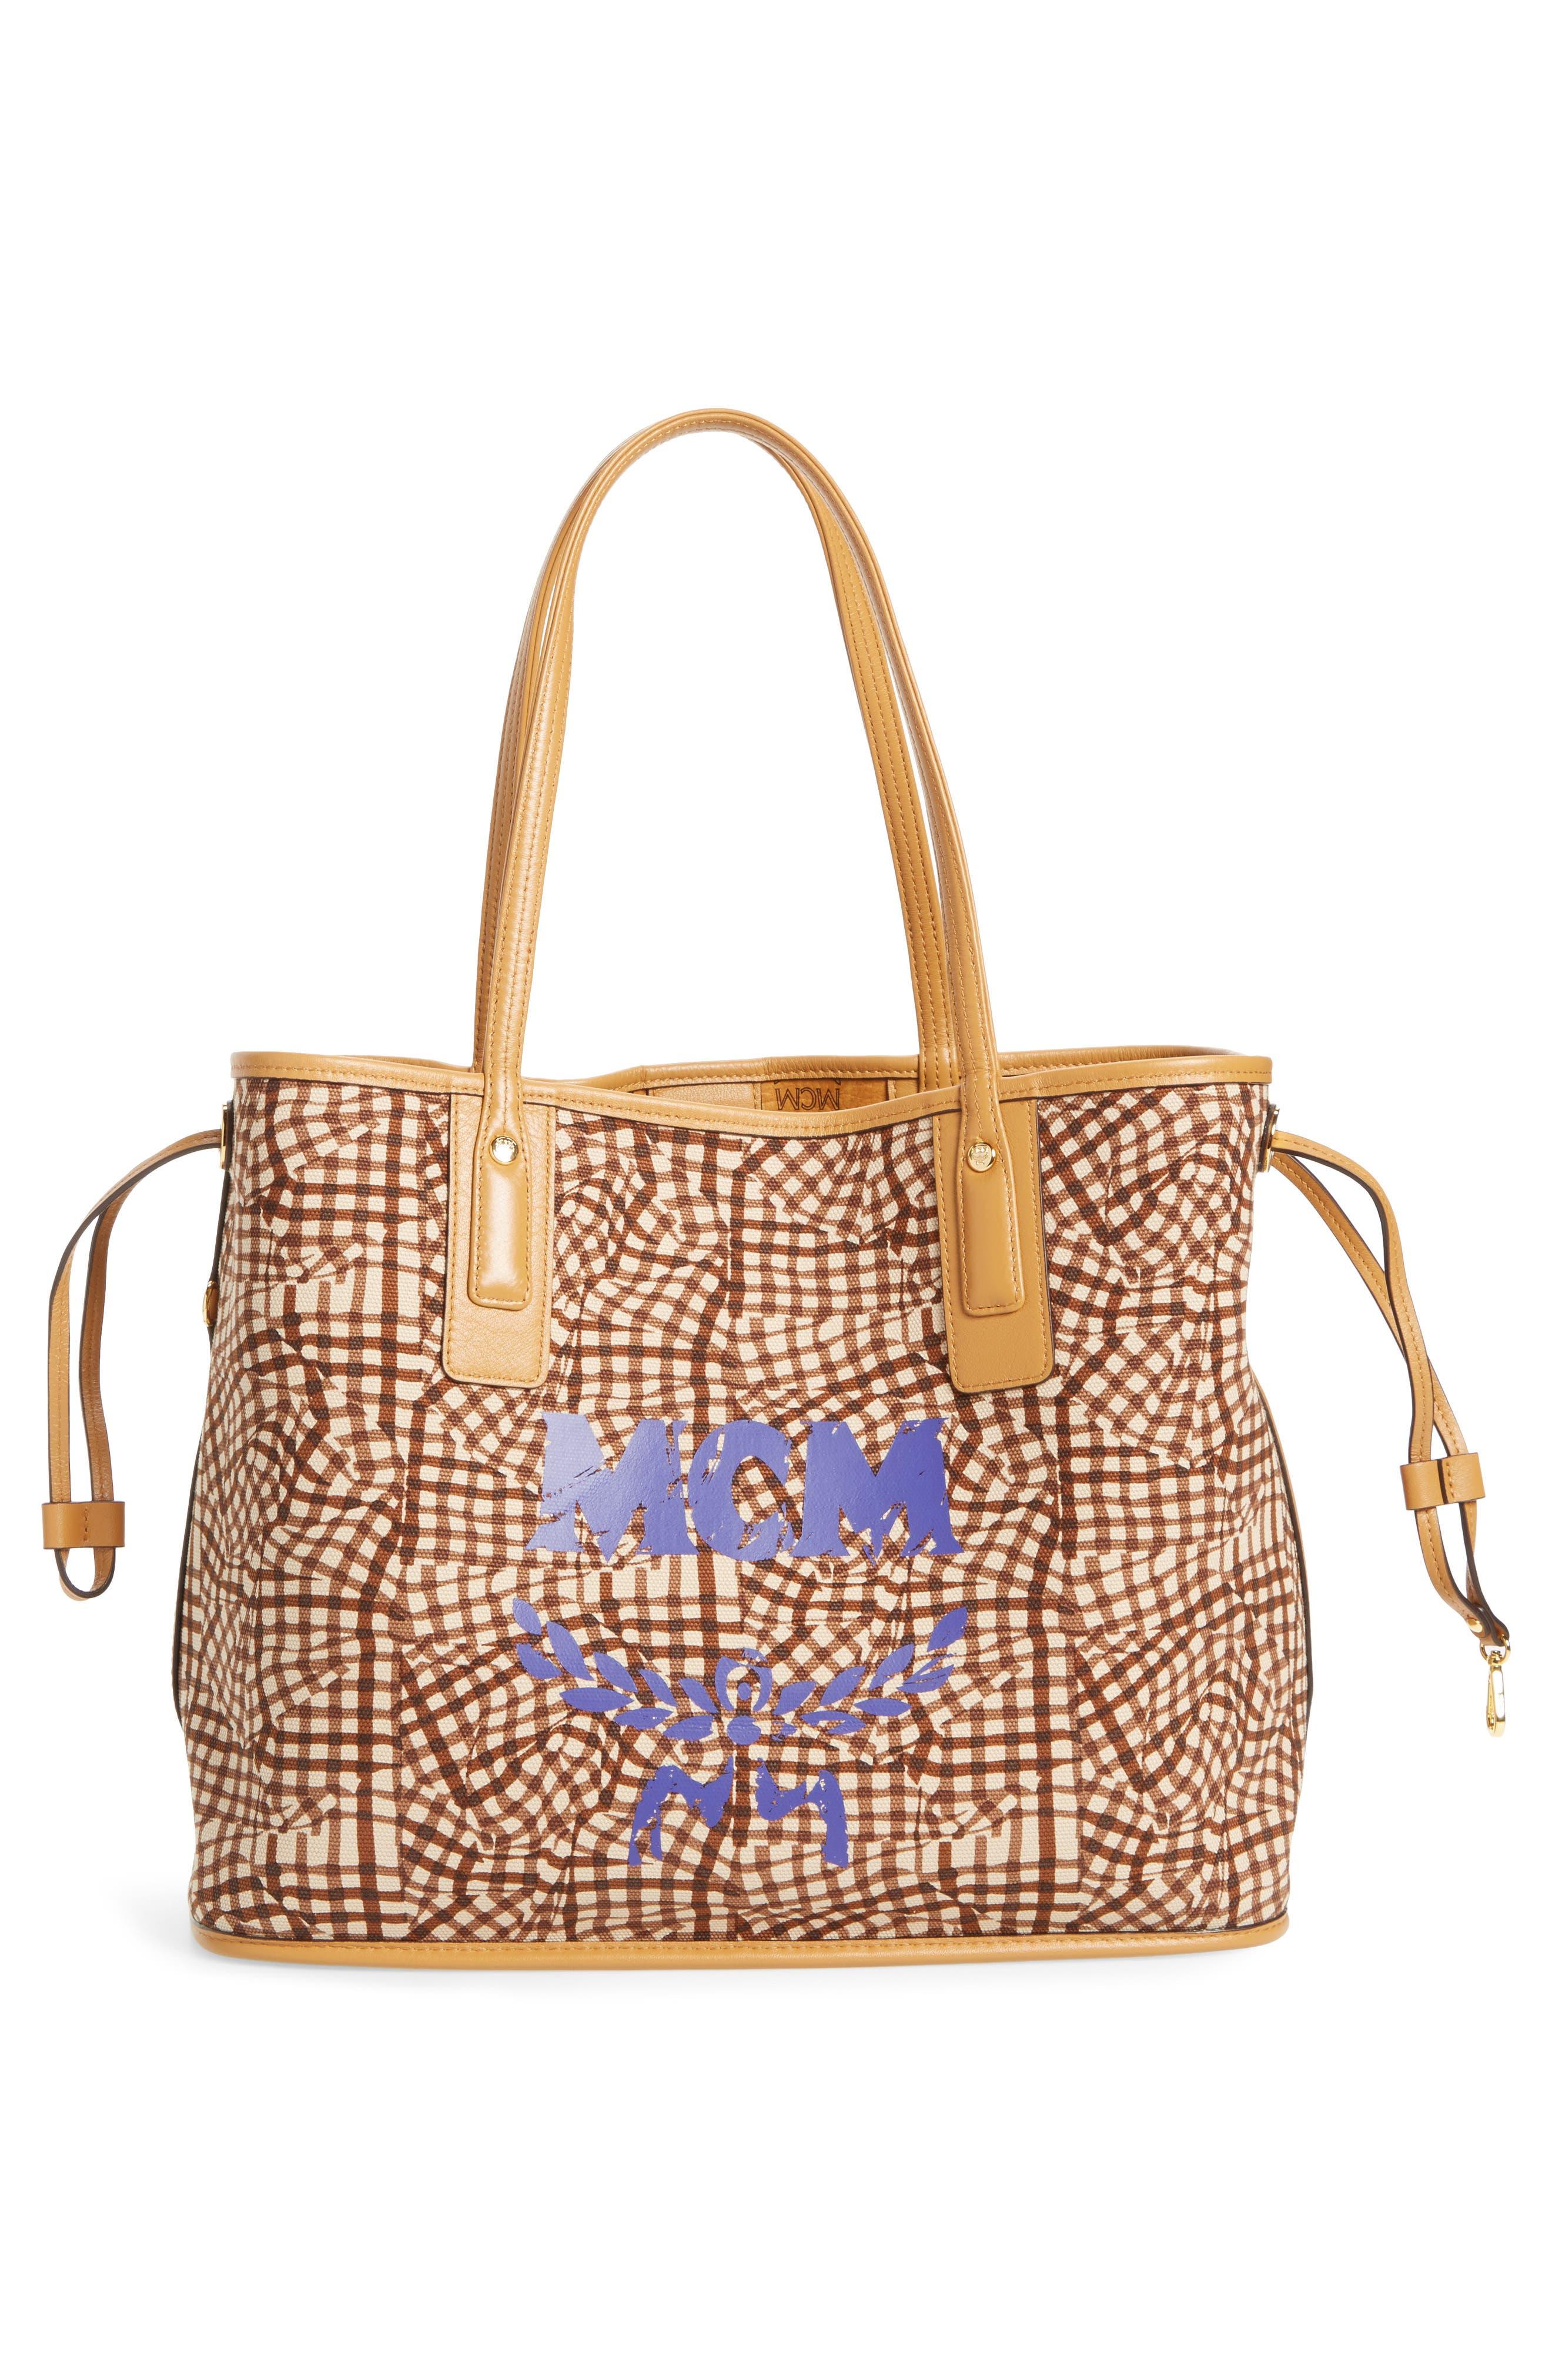 c718bce6affa Women's MCM Designer Handbags & Wallets | Nordstrom